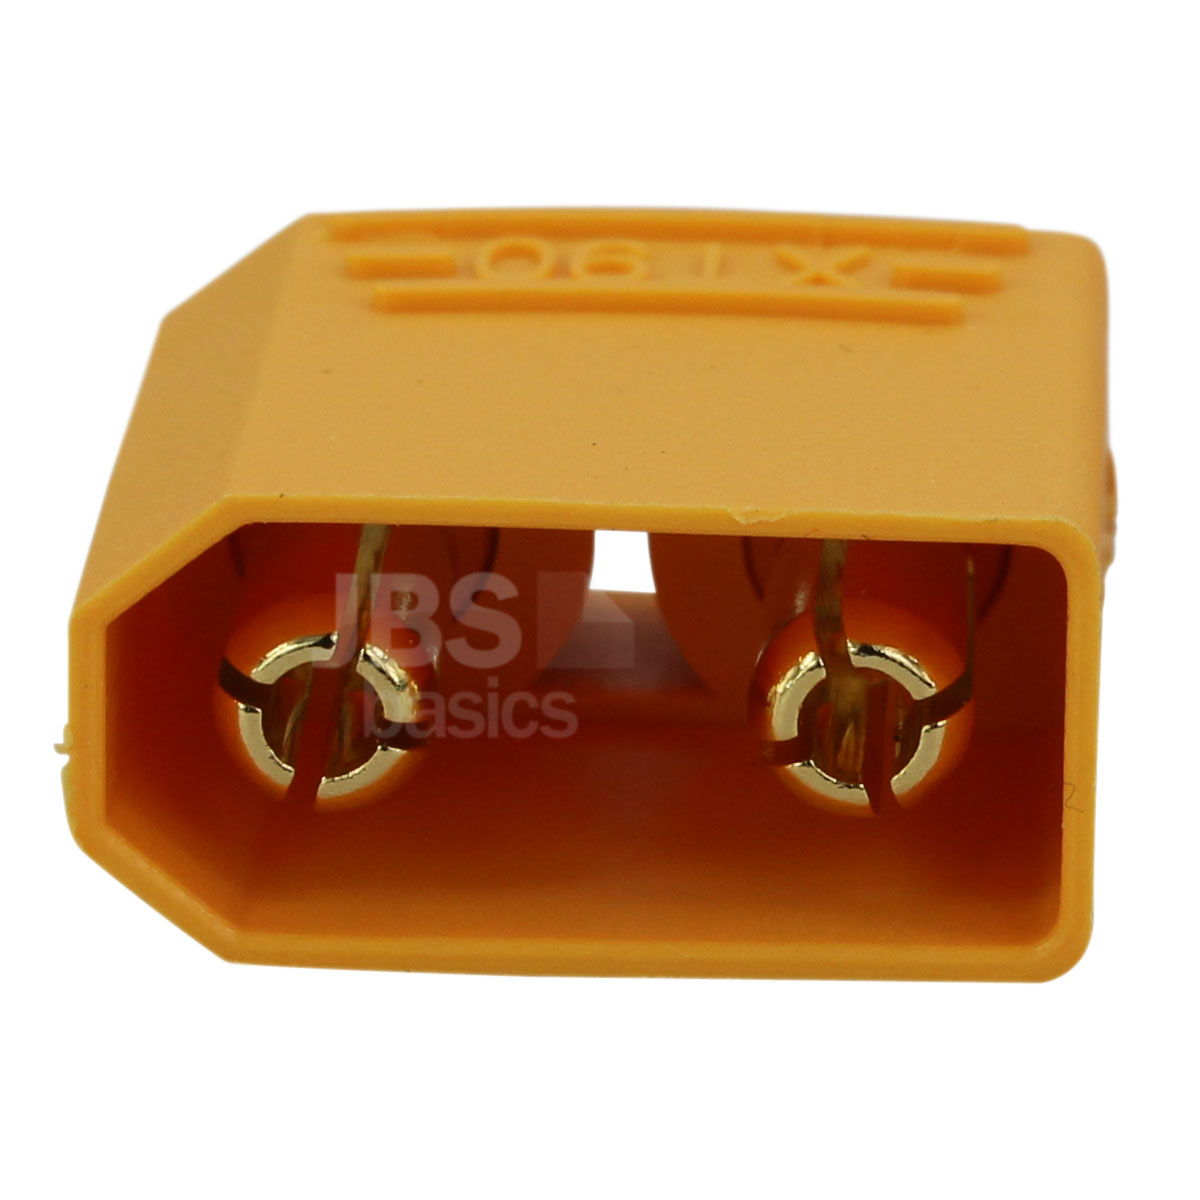 XT60 Hochstrom Stecker Buchse Akku Nylon Goldstecker Lipo NEU ► 20 Stk 10 Paar